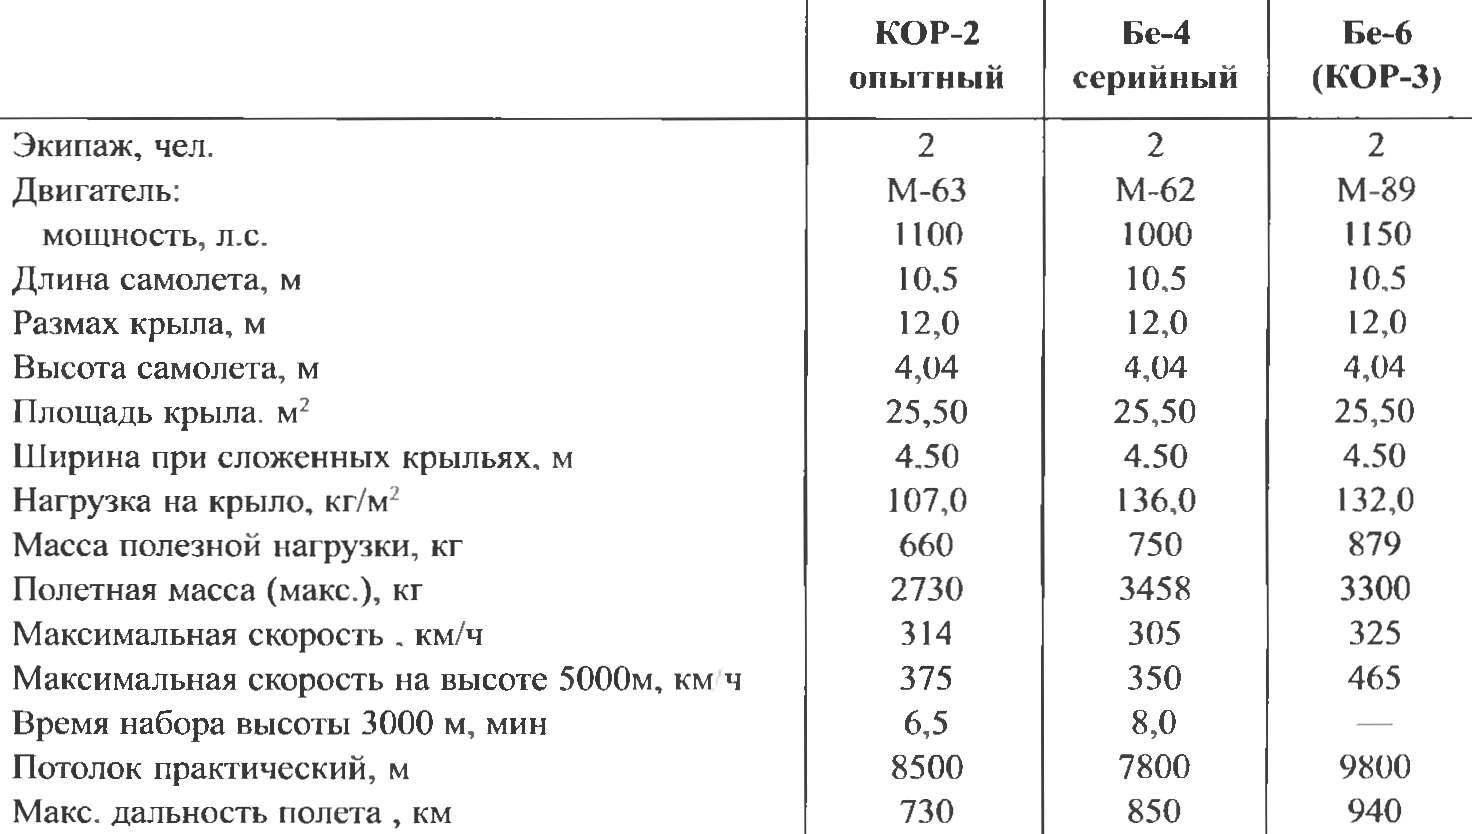 Flight characteristics of aircraft of COR-2